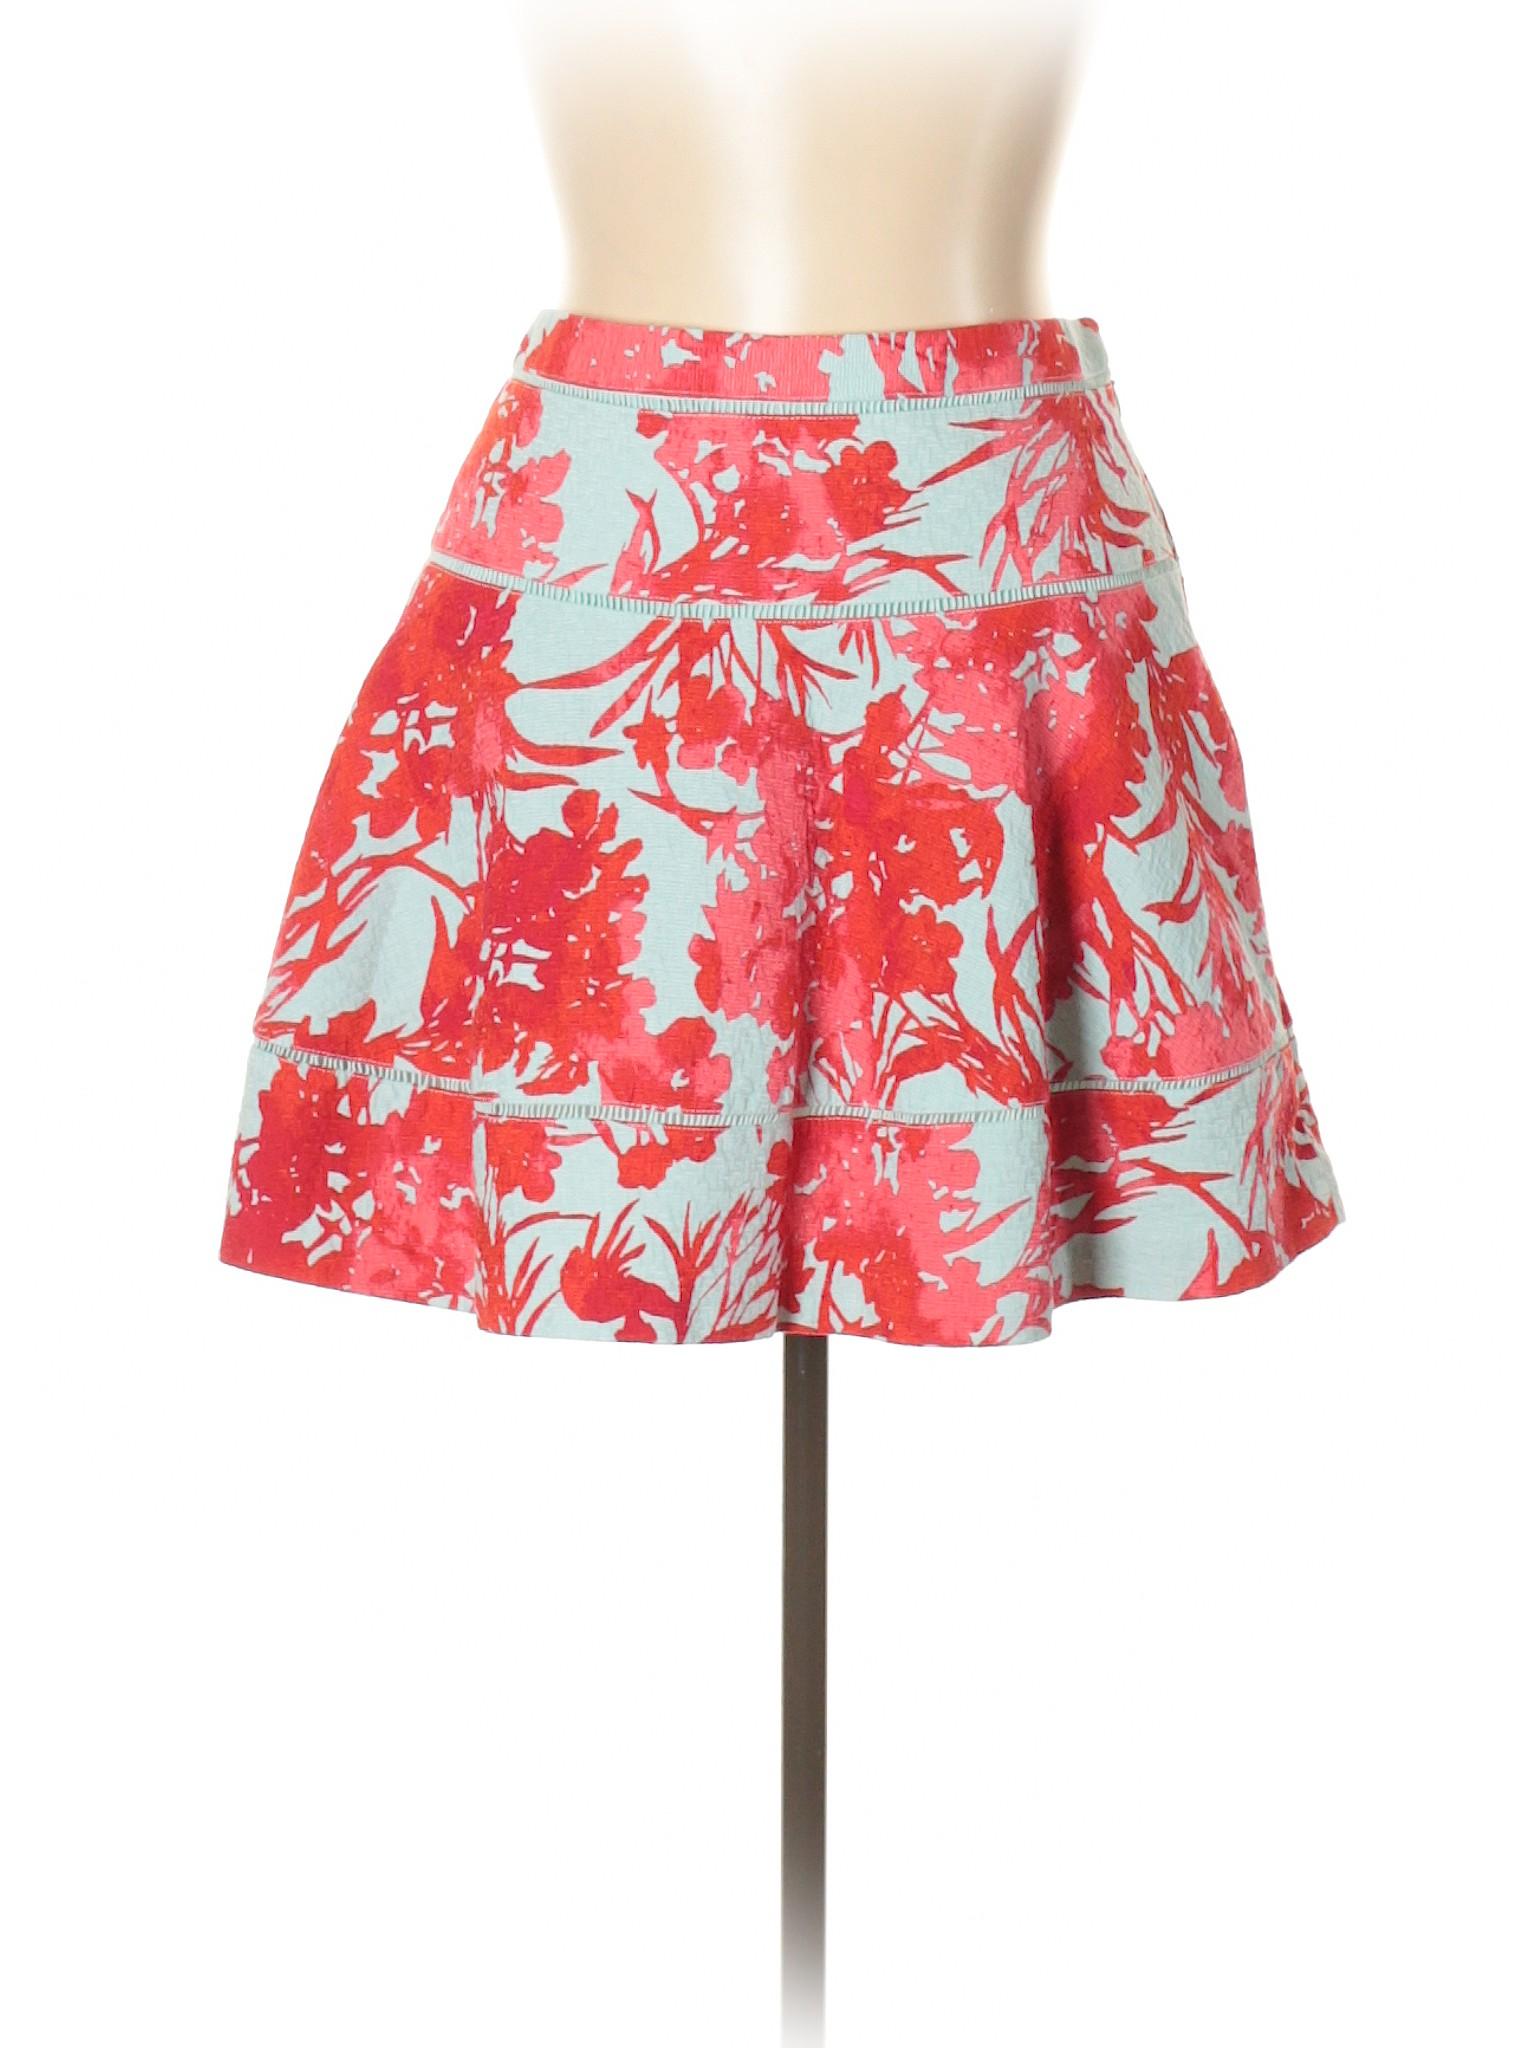 Banana Skirt leisure Casual Boutique Republic Zq0wnU